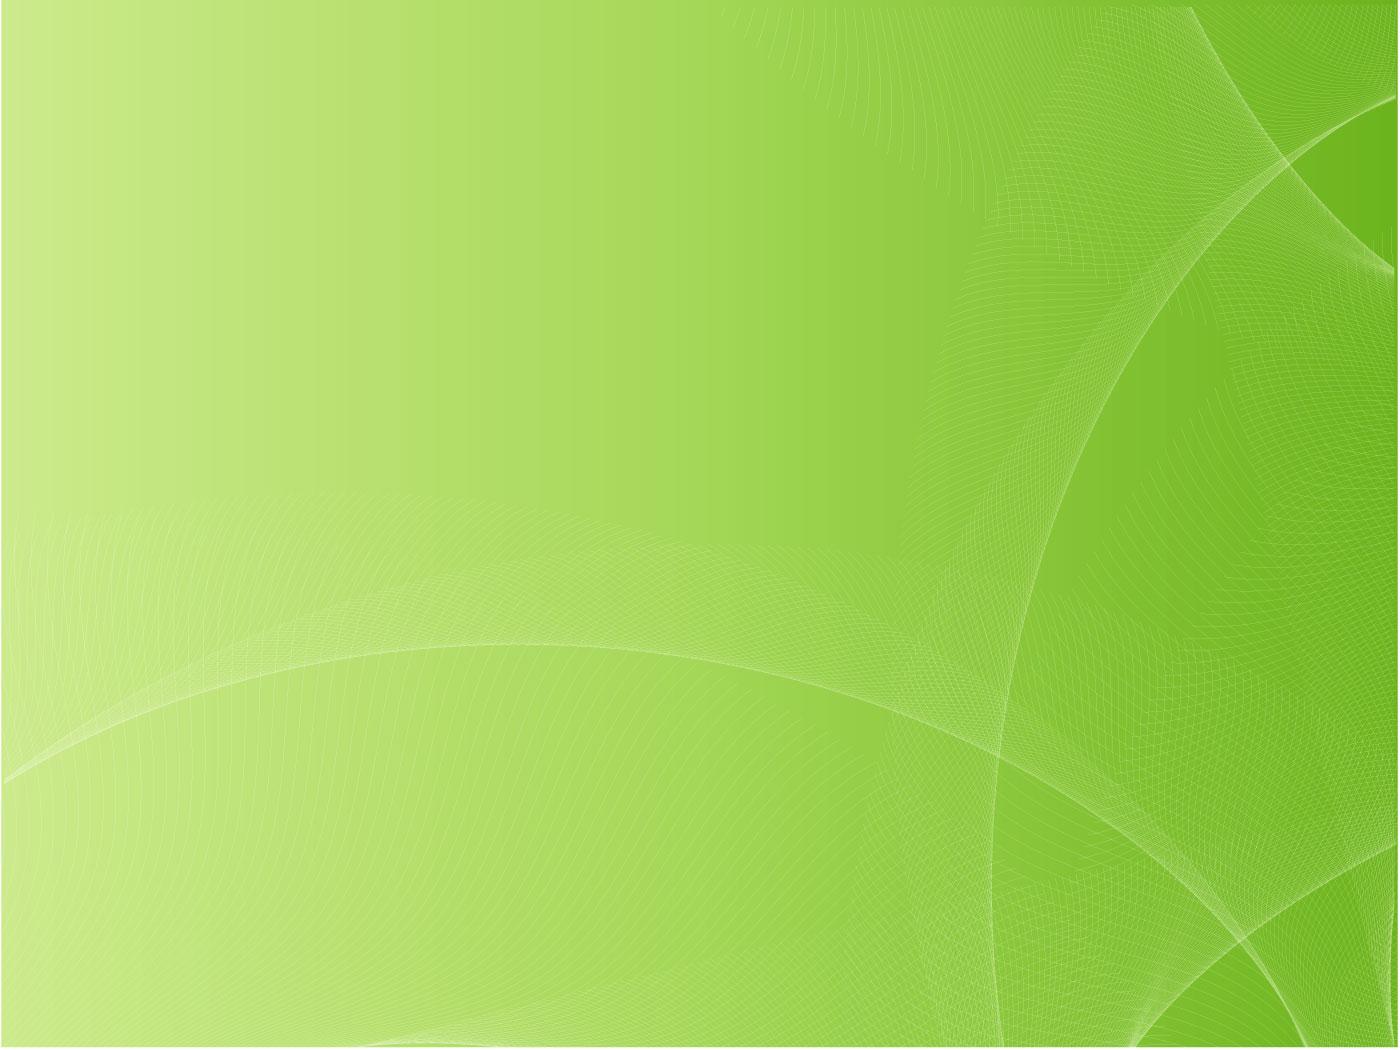 Light Green Abstract Vector Background light green abstract vector 1400x1050